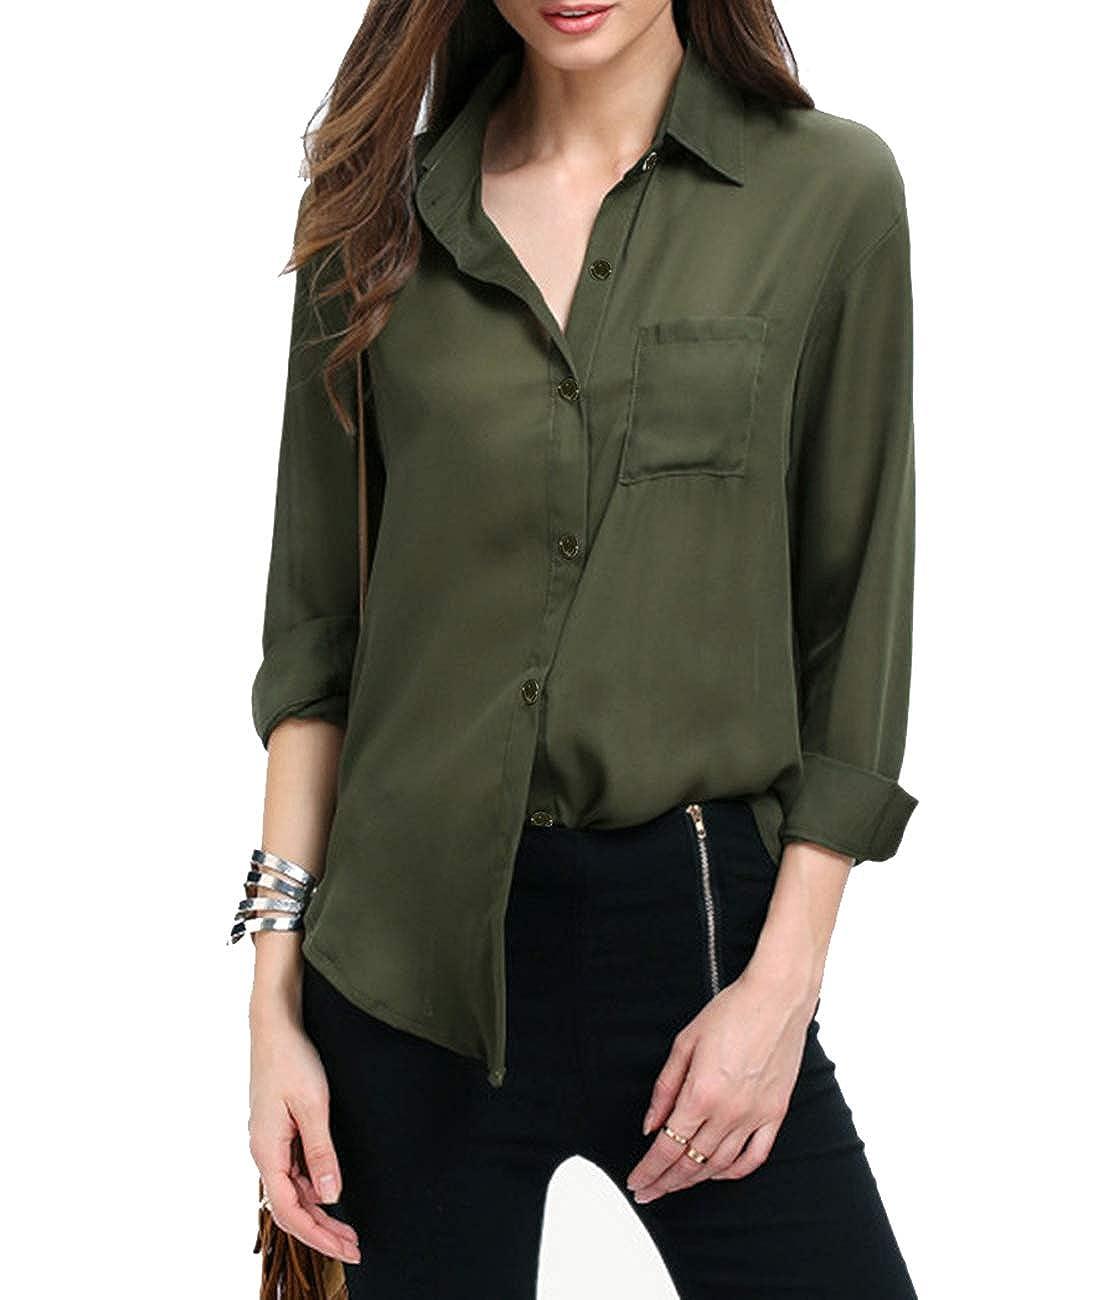 45c6be7ff426f Yidarton Women Long Sleeve Chiffon Shirt Boxy Blouse Button Down Chiffon  Blouse Shirts Tops with Chest Pocket at Amazon Women s Clothing store